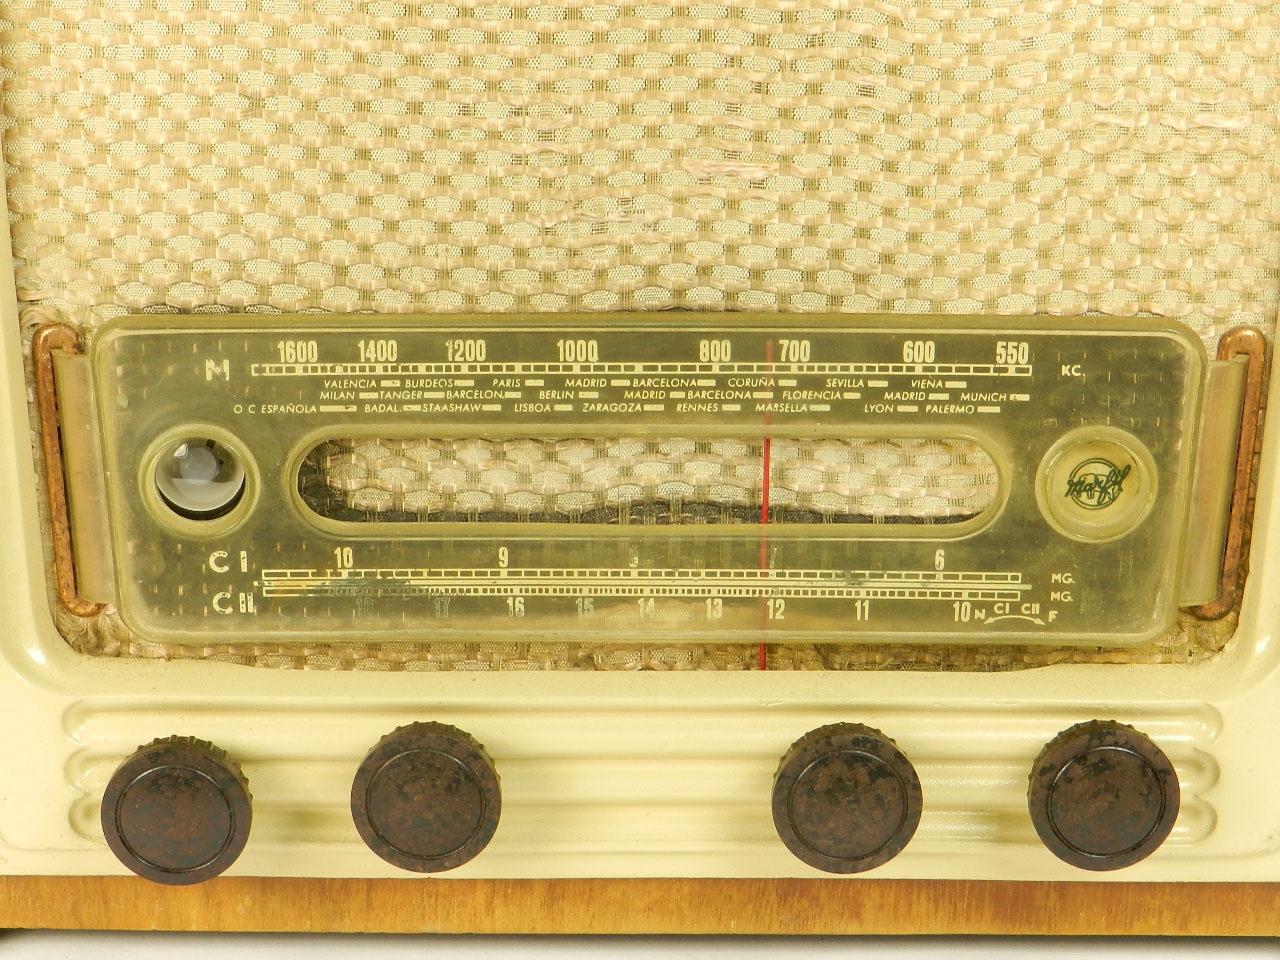 Imagen RADIO MARFIL AN-355 O.M  AÑO 1950 25919